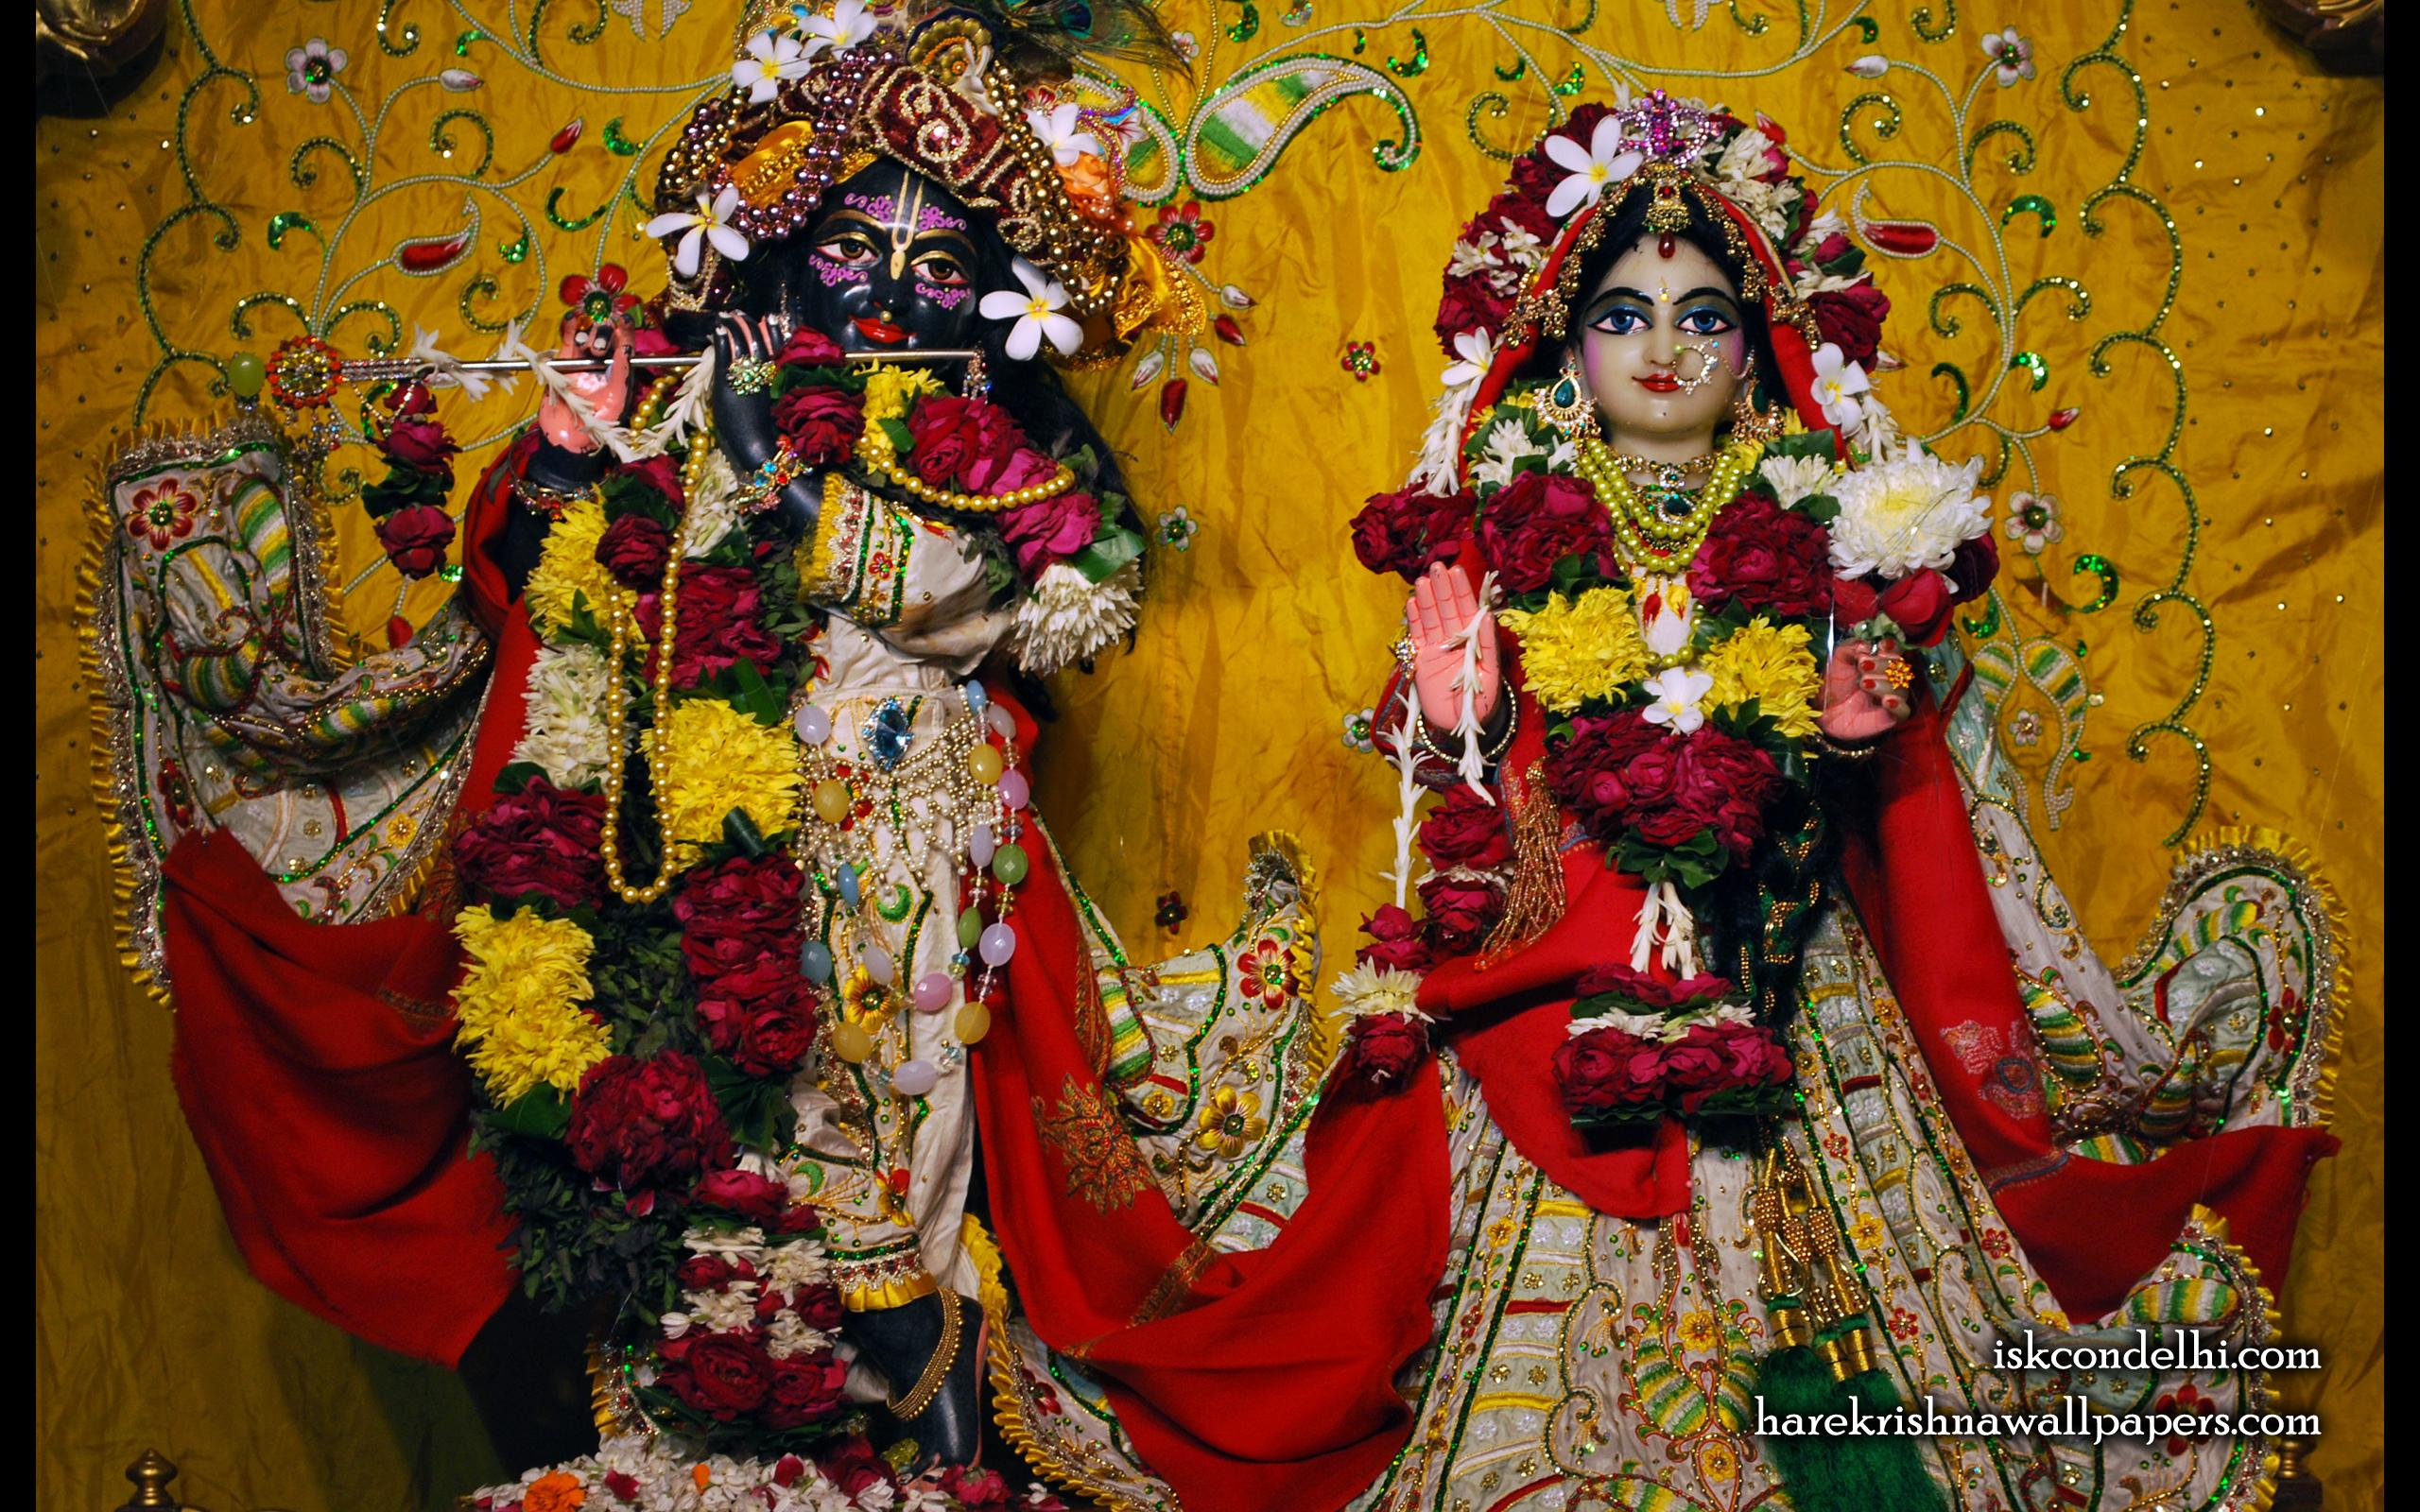 Sri Sri Radha Parthasarathi Wallpaper (004) Size 2560x1600 Download